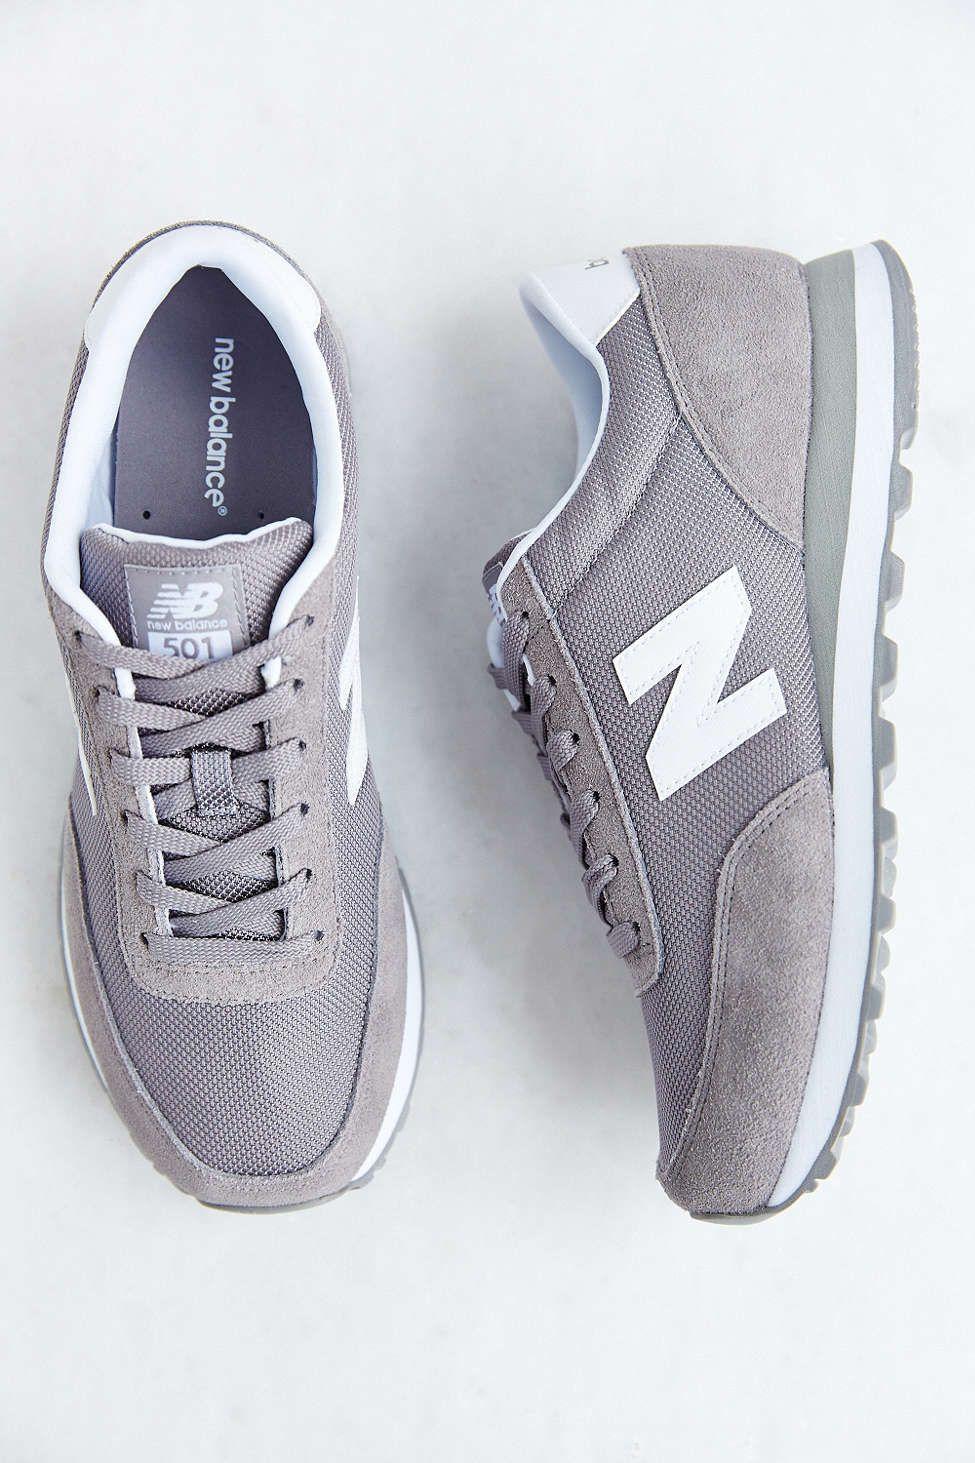 new balance 501 in grey